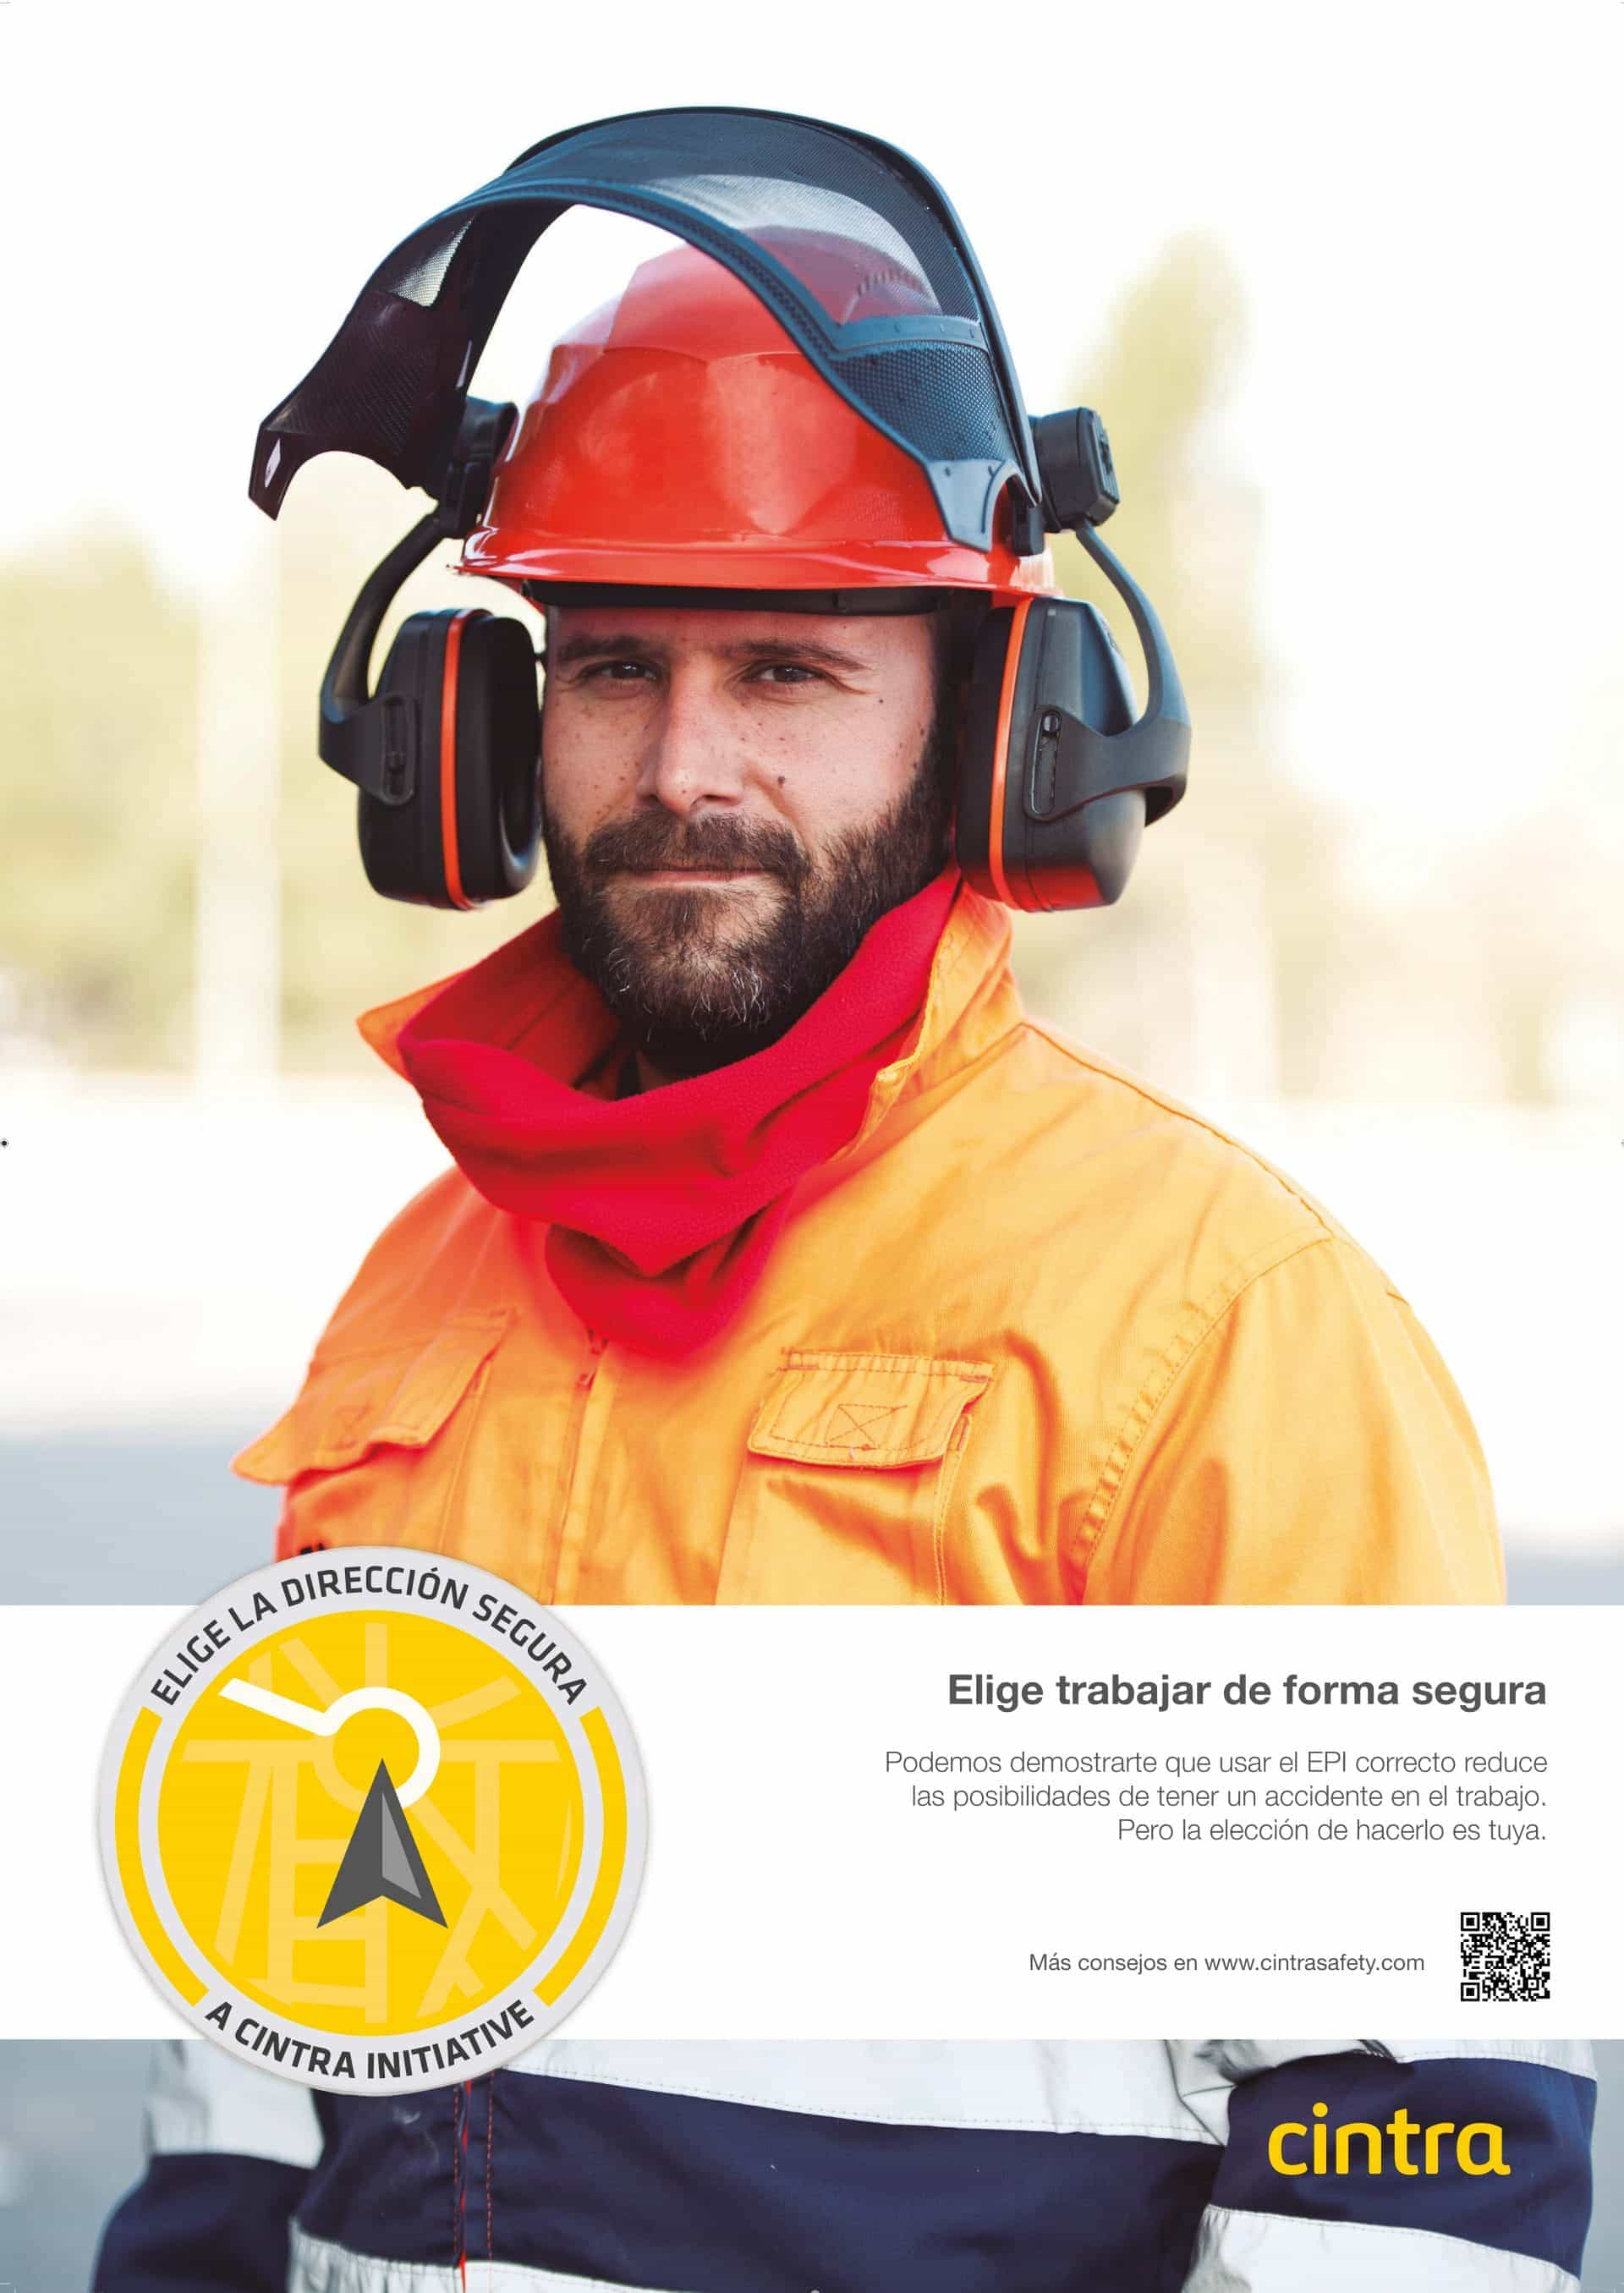 Campaña 'Choose the safe way' de Cintra